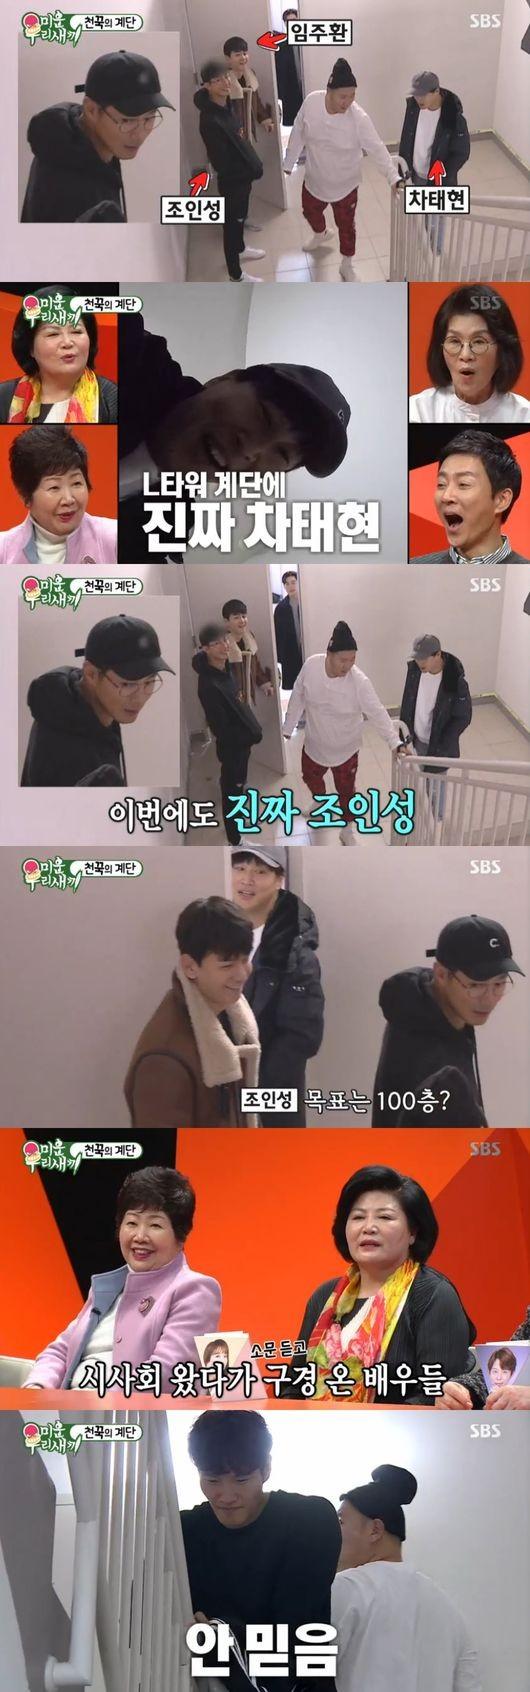 Dongchimi Tv Show